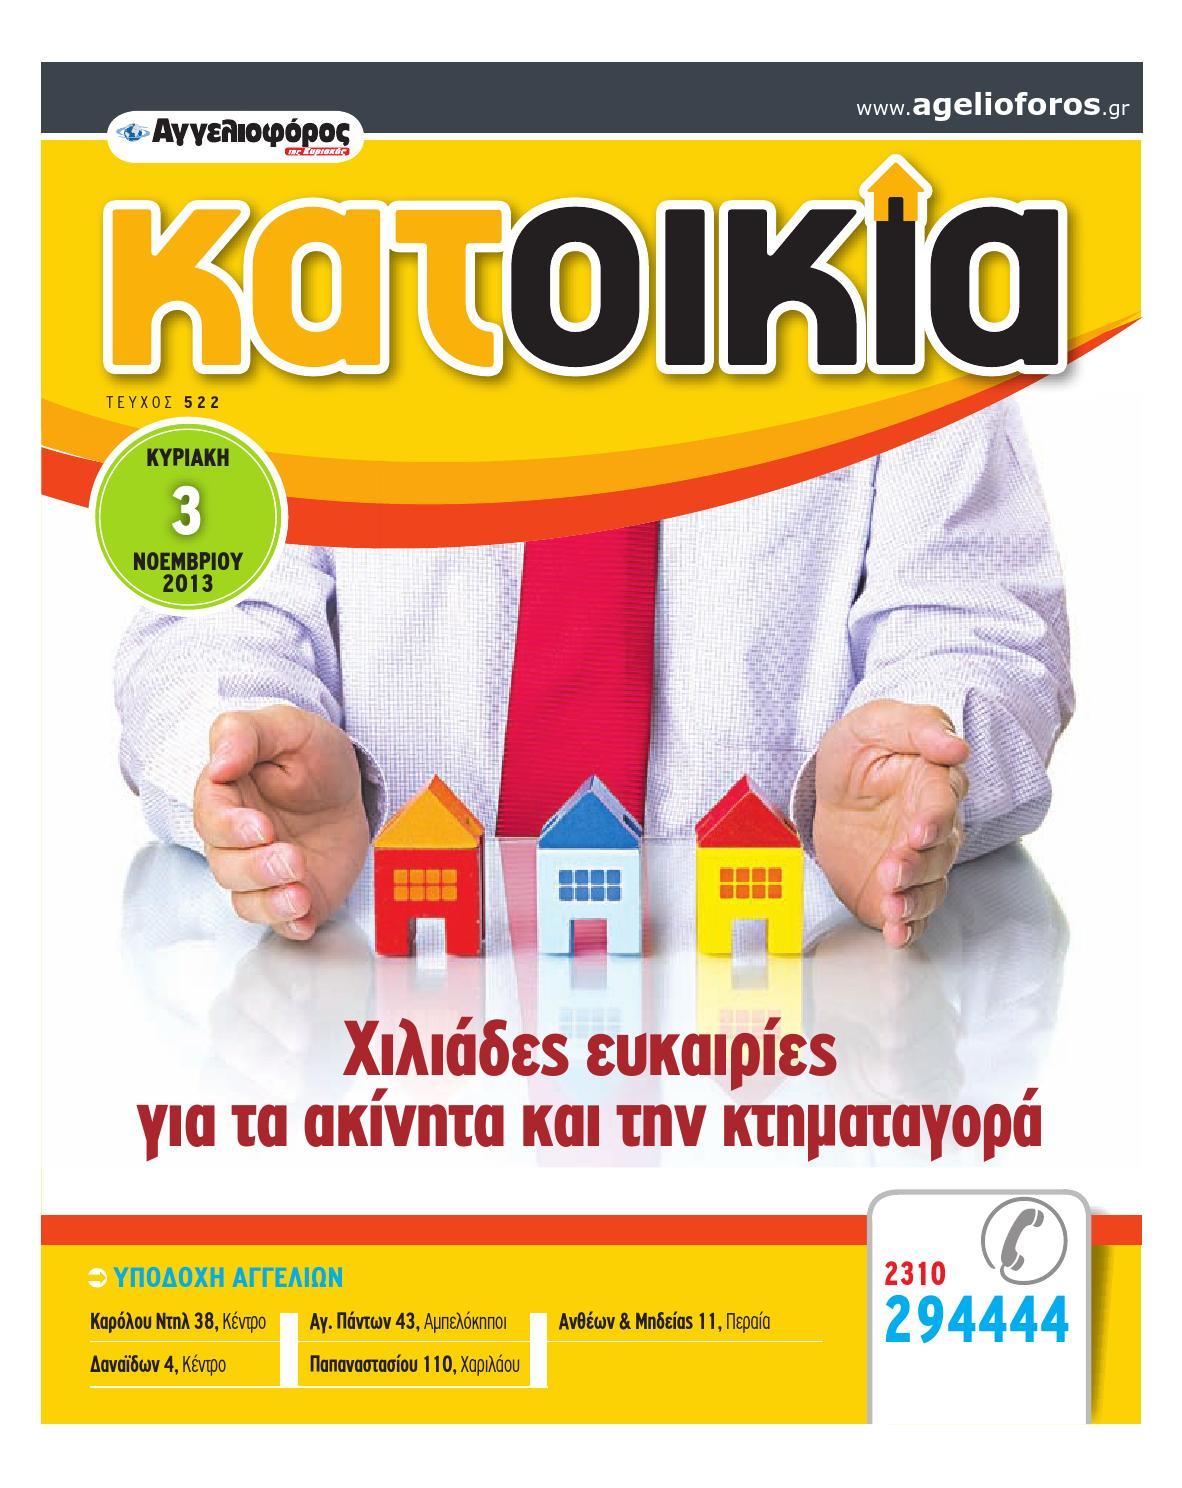 0f3905e63c Κατοικία 03 11 2013 by Εκδοτική Βορείου Ελλάδος Α.Ε. - issuu